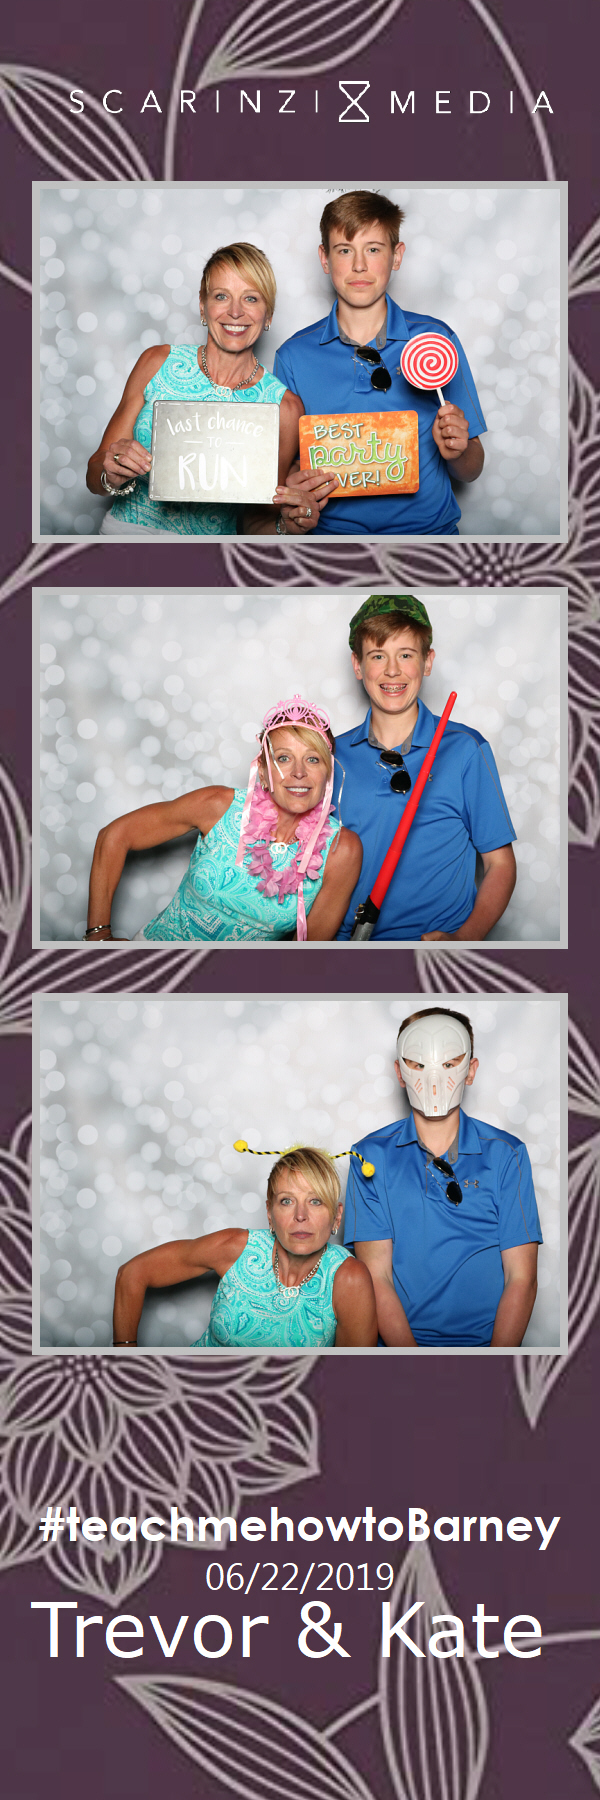 2019.06.22 - Barney Wedding PHOTOBOOTH35.jpg